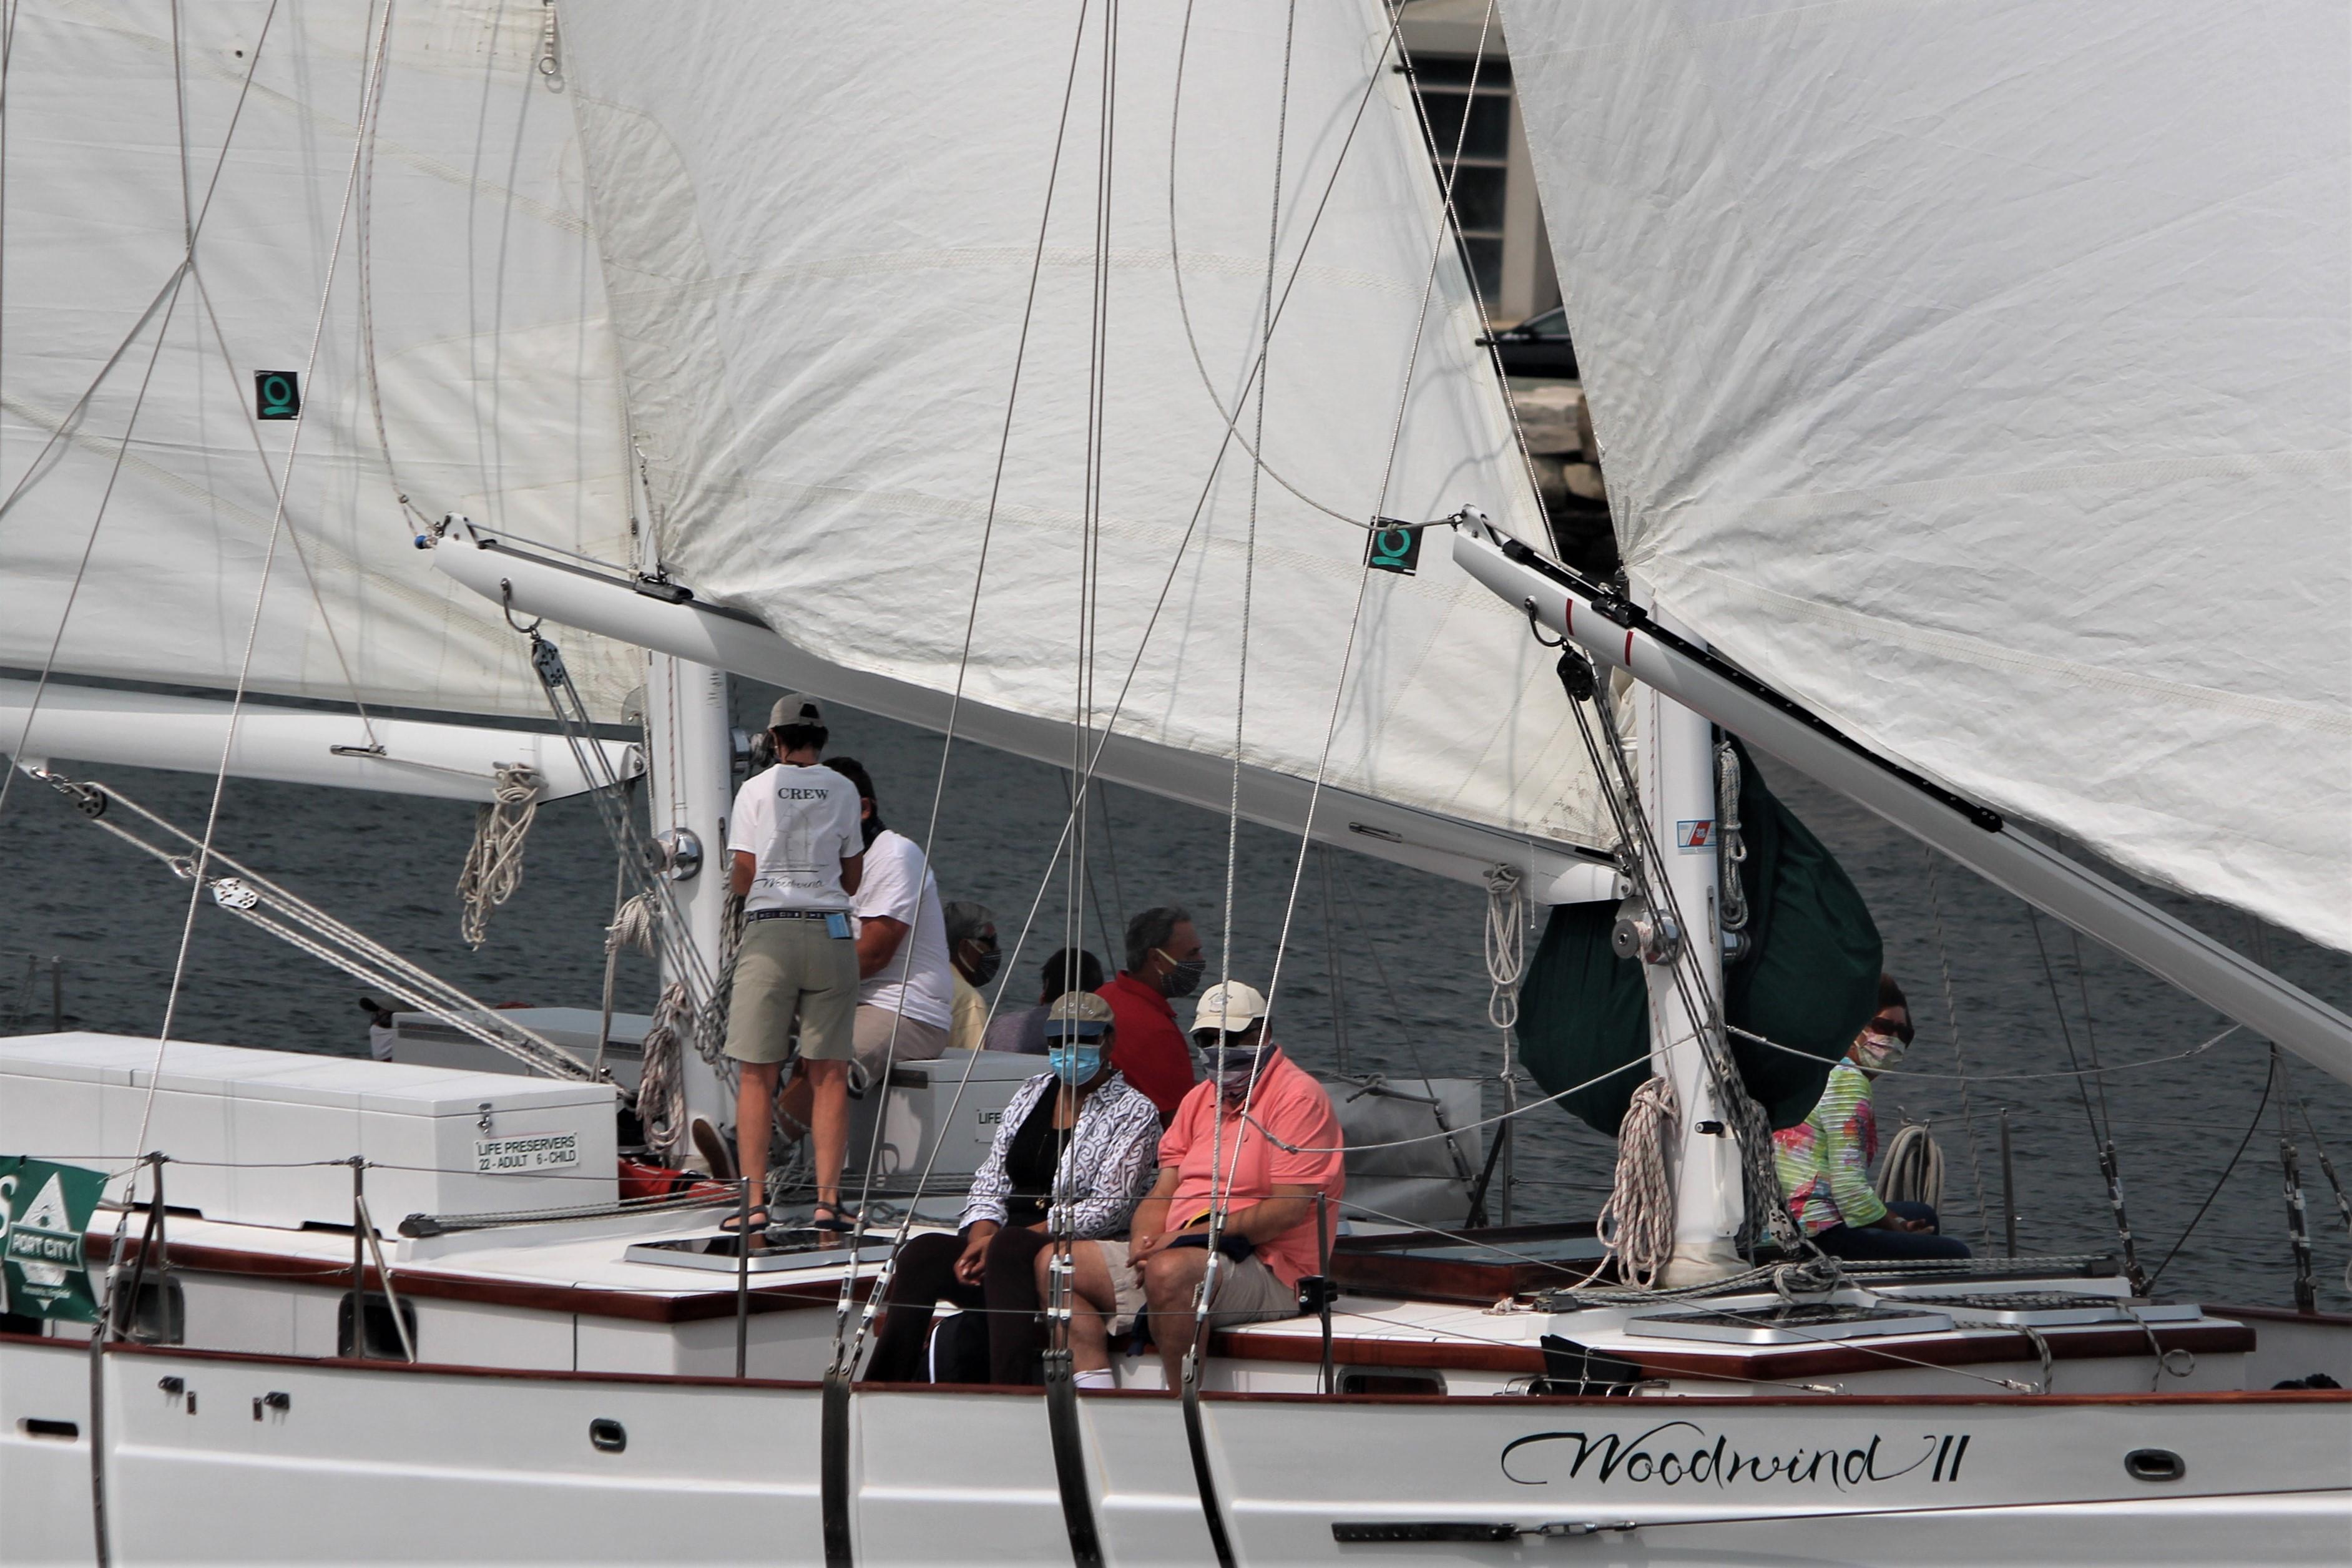 Masked passengers sailing on Chesapeake Bay